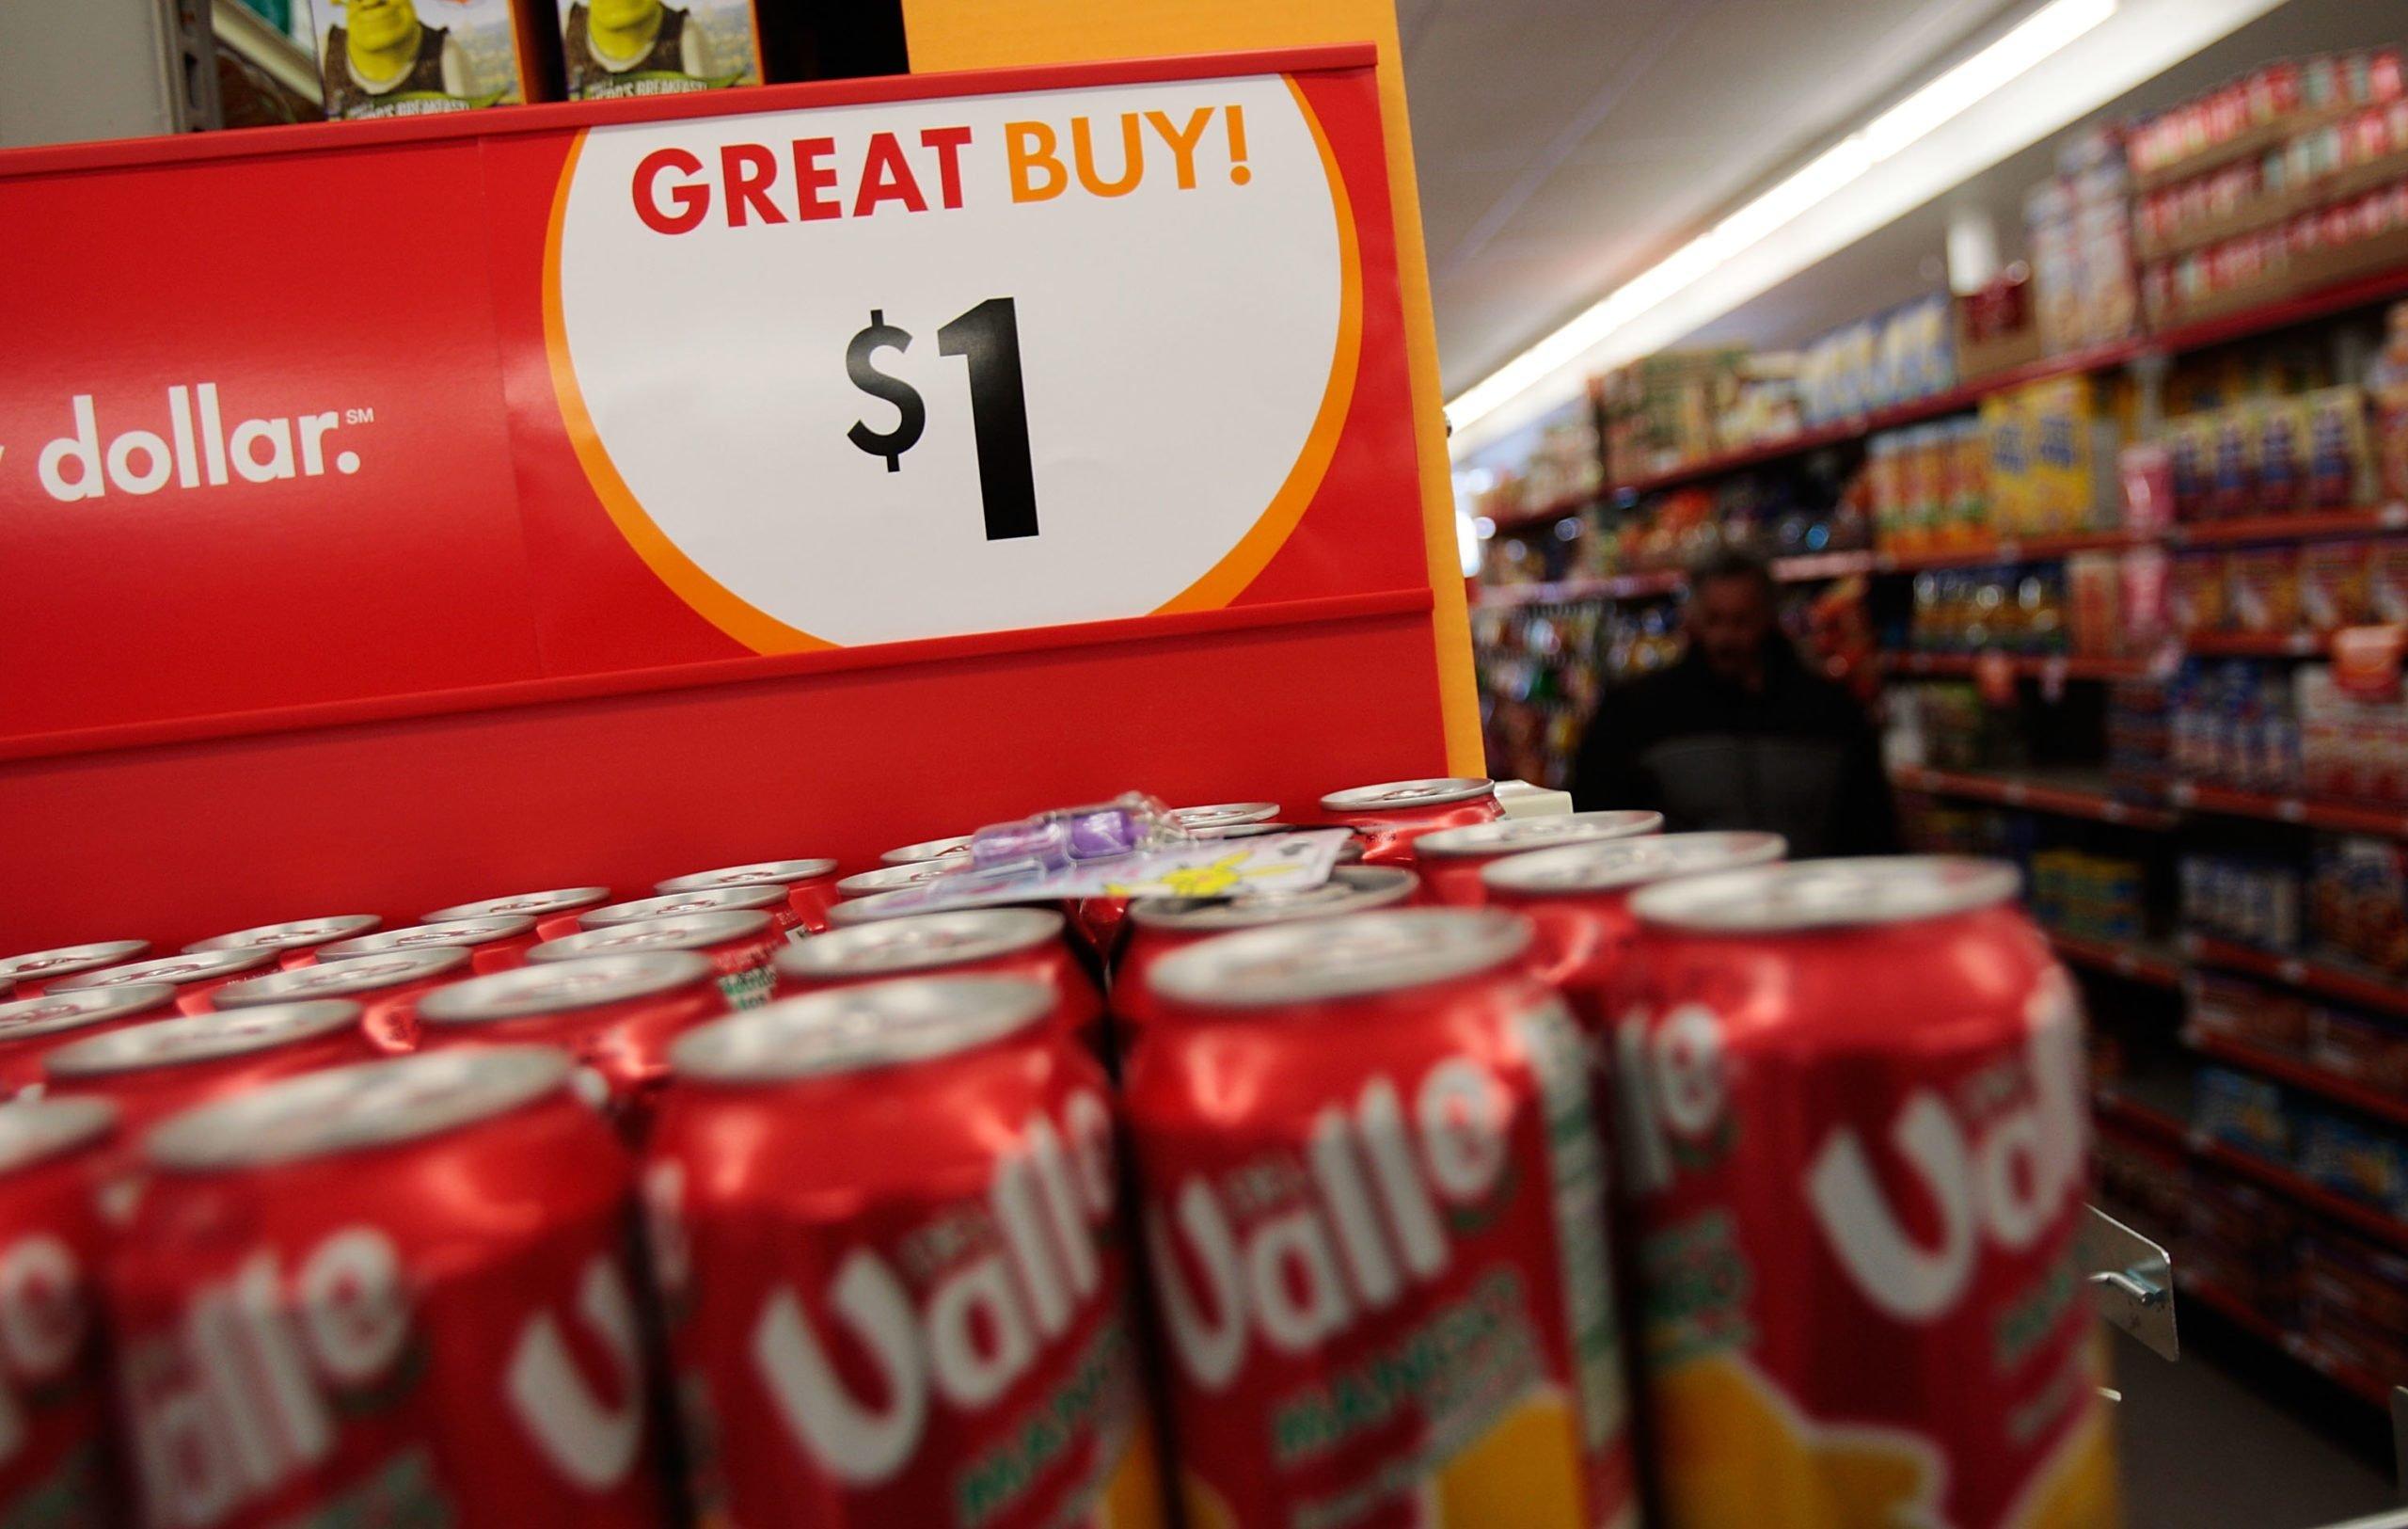 US Economic Slowdown Prompts Rise in Price of Staple Foods